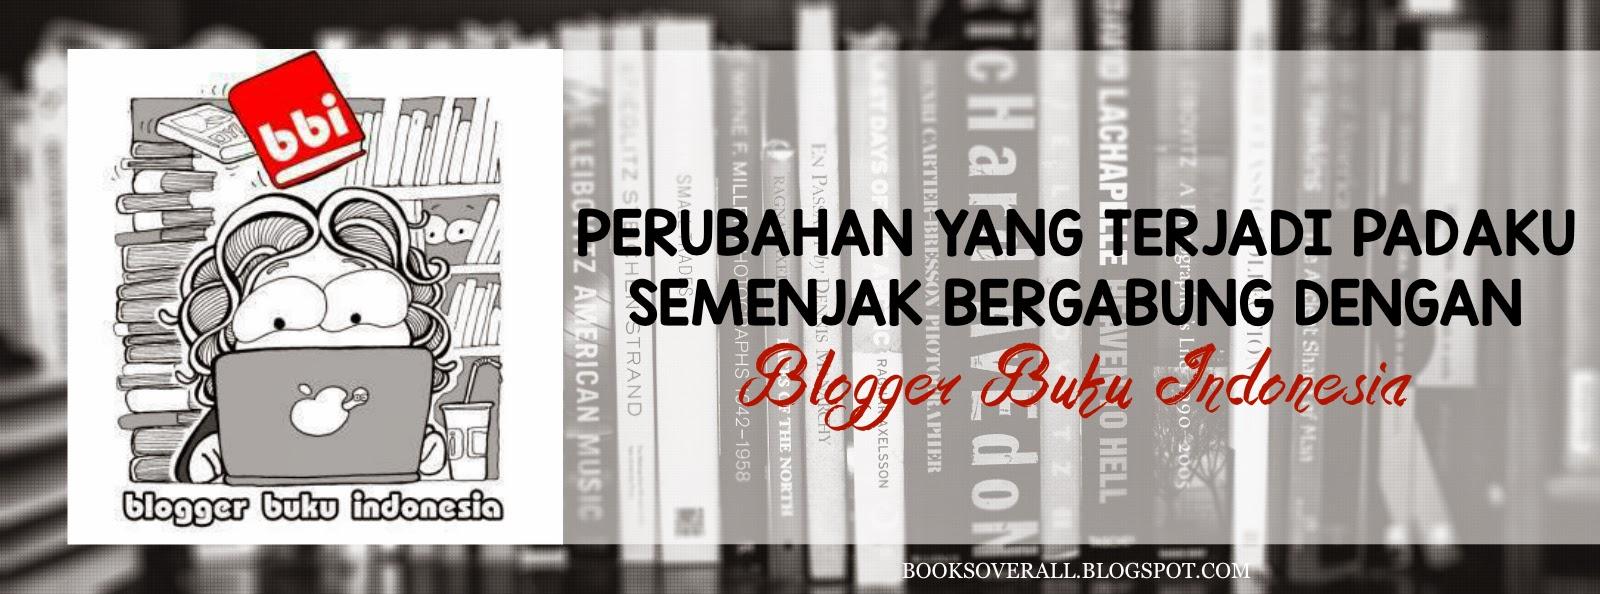 BOOKS -over- ALL: PosBar BBI 4th Anniversary: Perubahan Yang